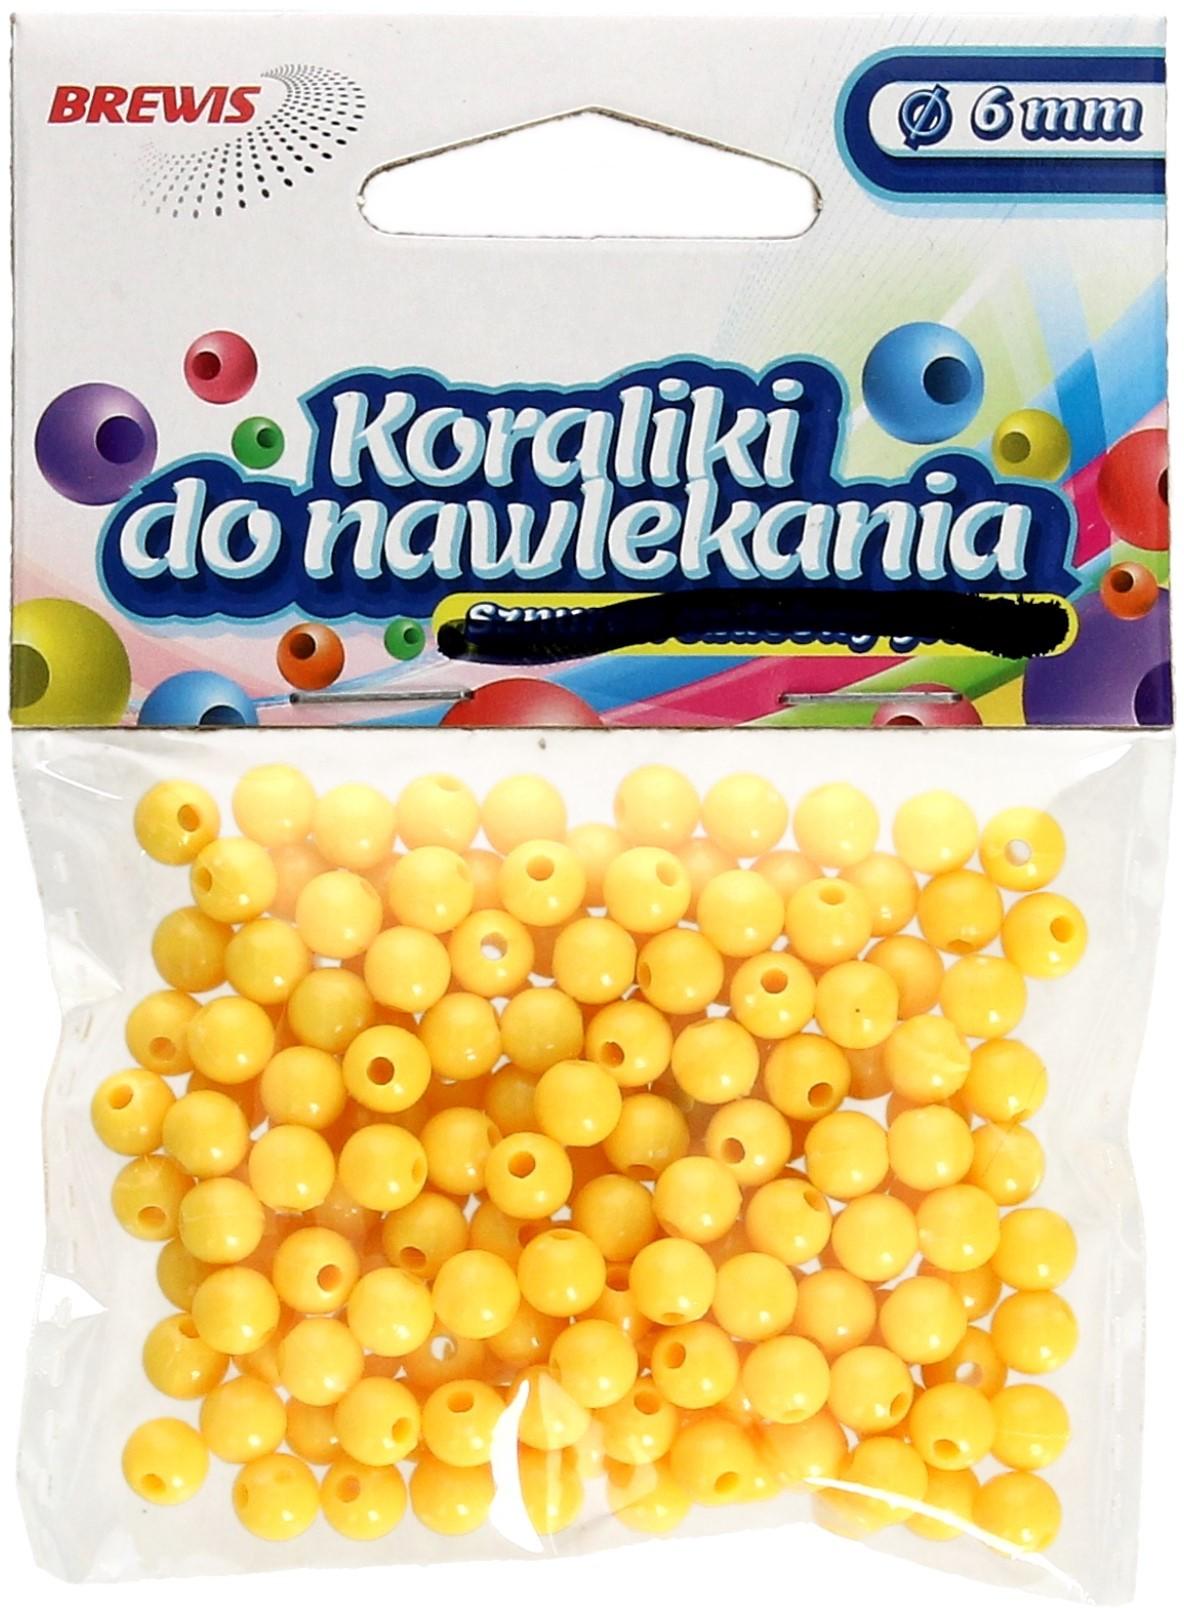 Brewis Koraliki ozdobne żółte K6 6mm VB8853